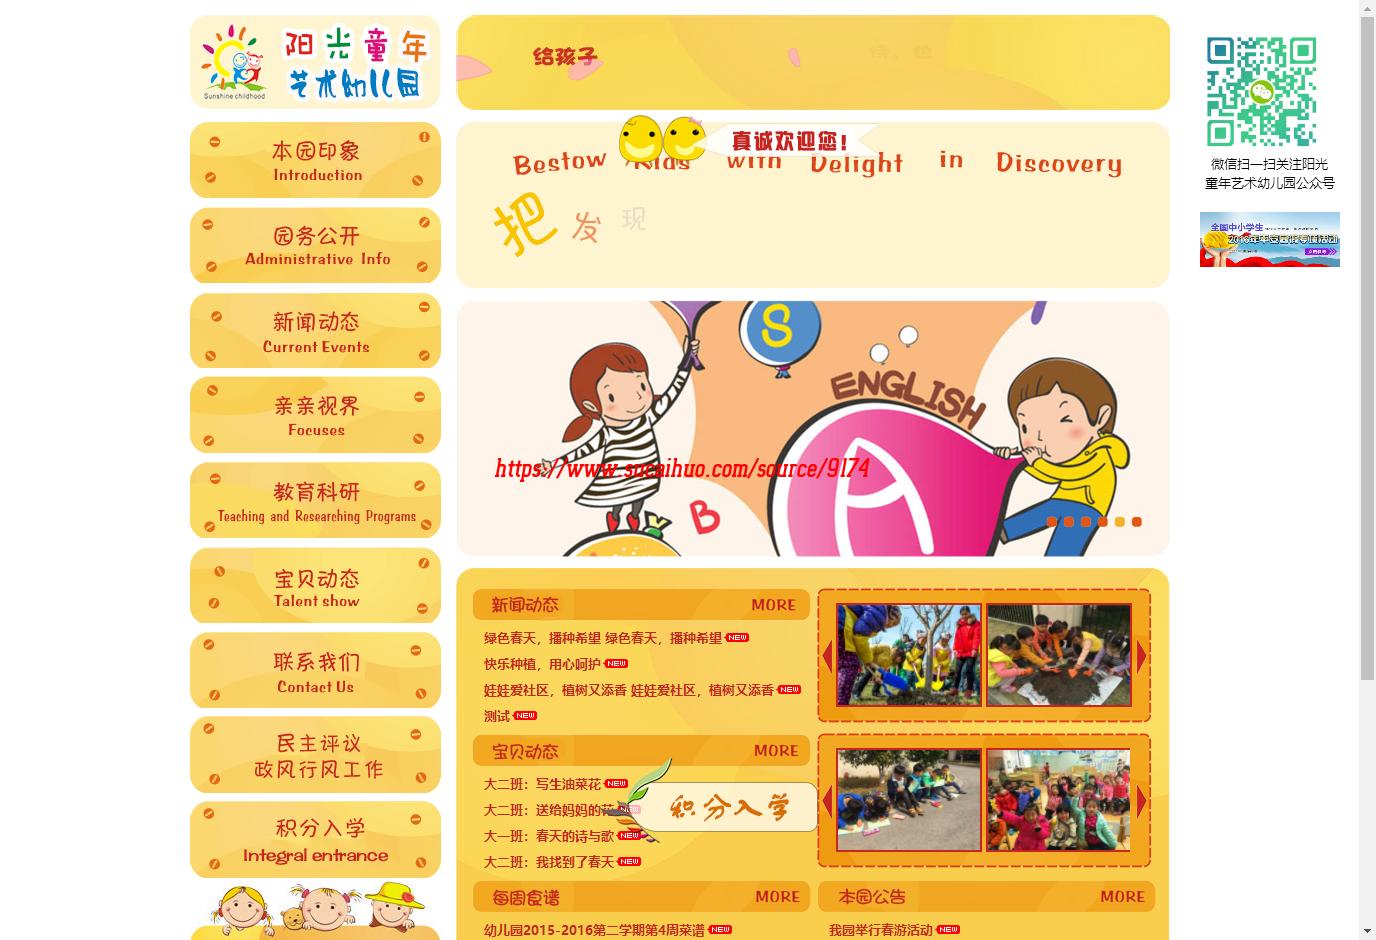 DEDECMS幼儿园专业培训学校网站模板源码 企业通用模板源码